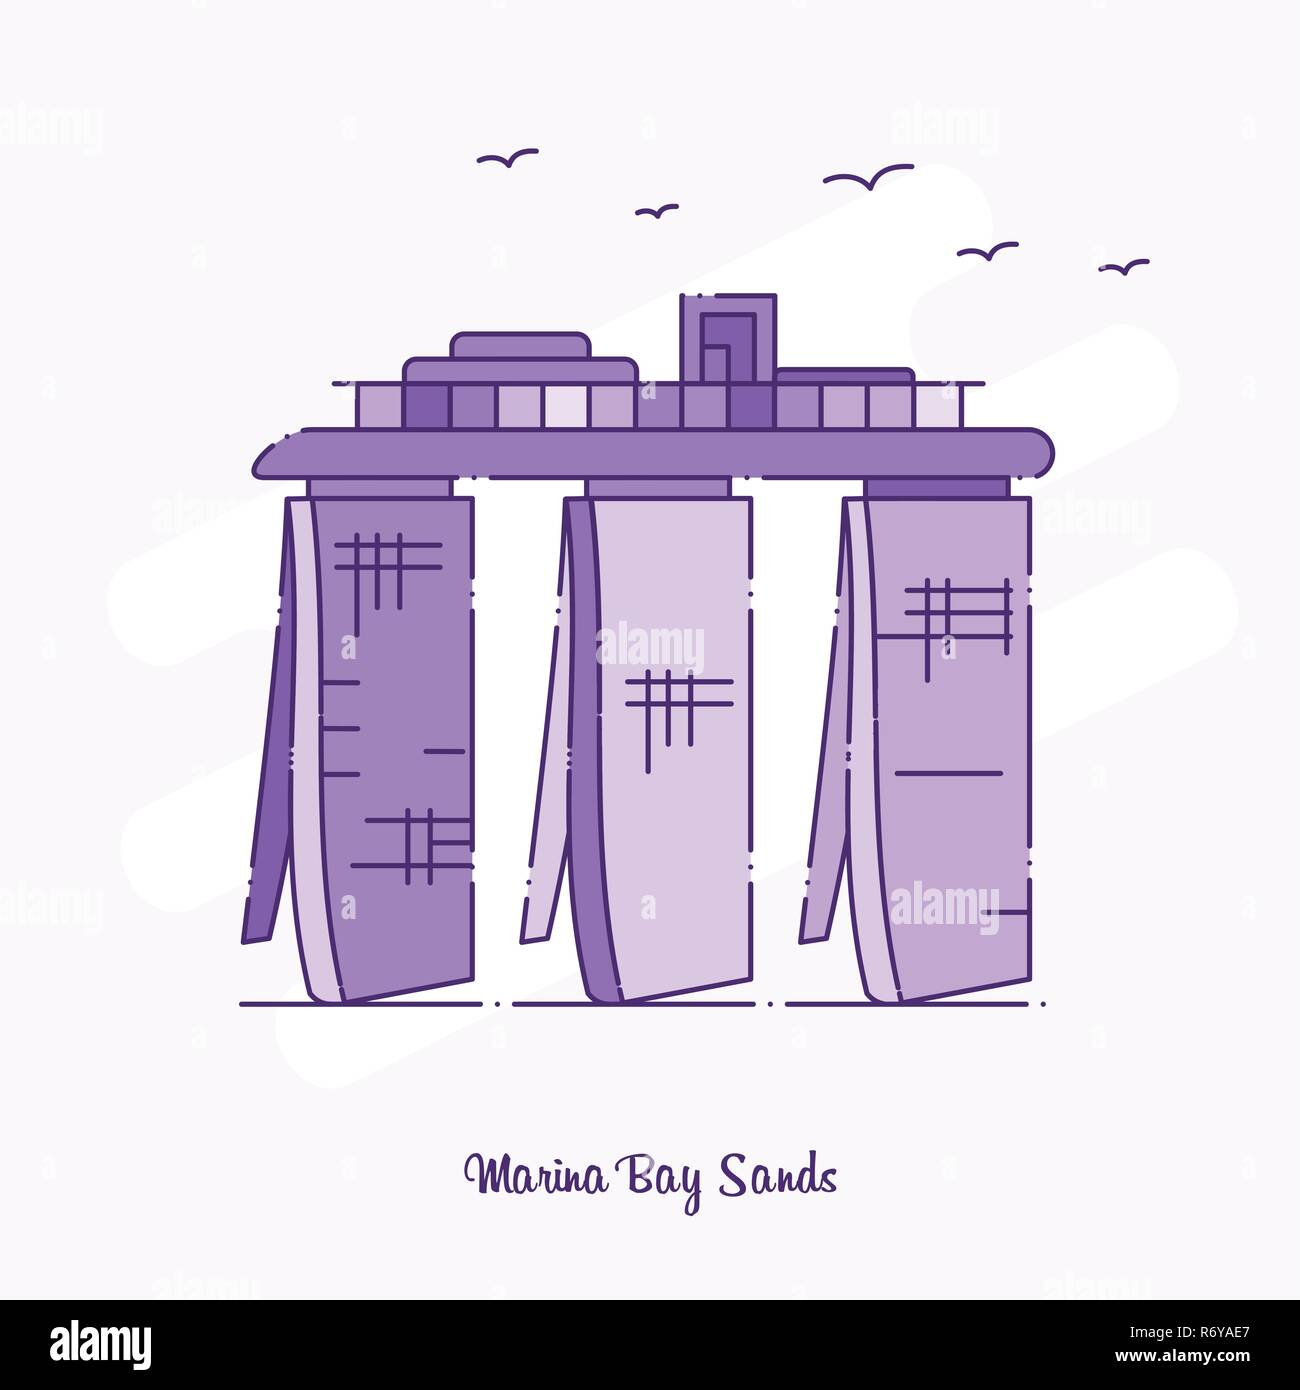 MARINA BAY SANDS Landmark Purple Dotted Line skyline vector illustration - Stock Image